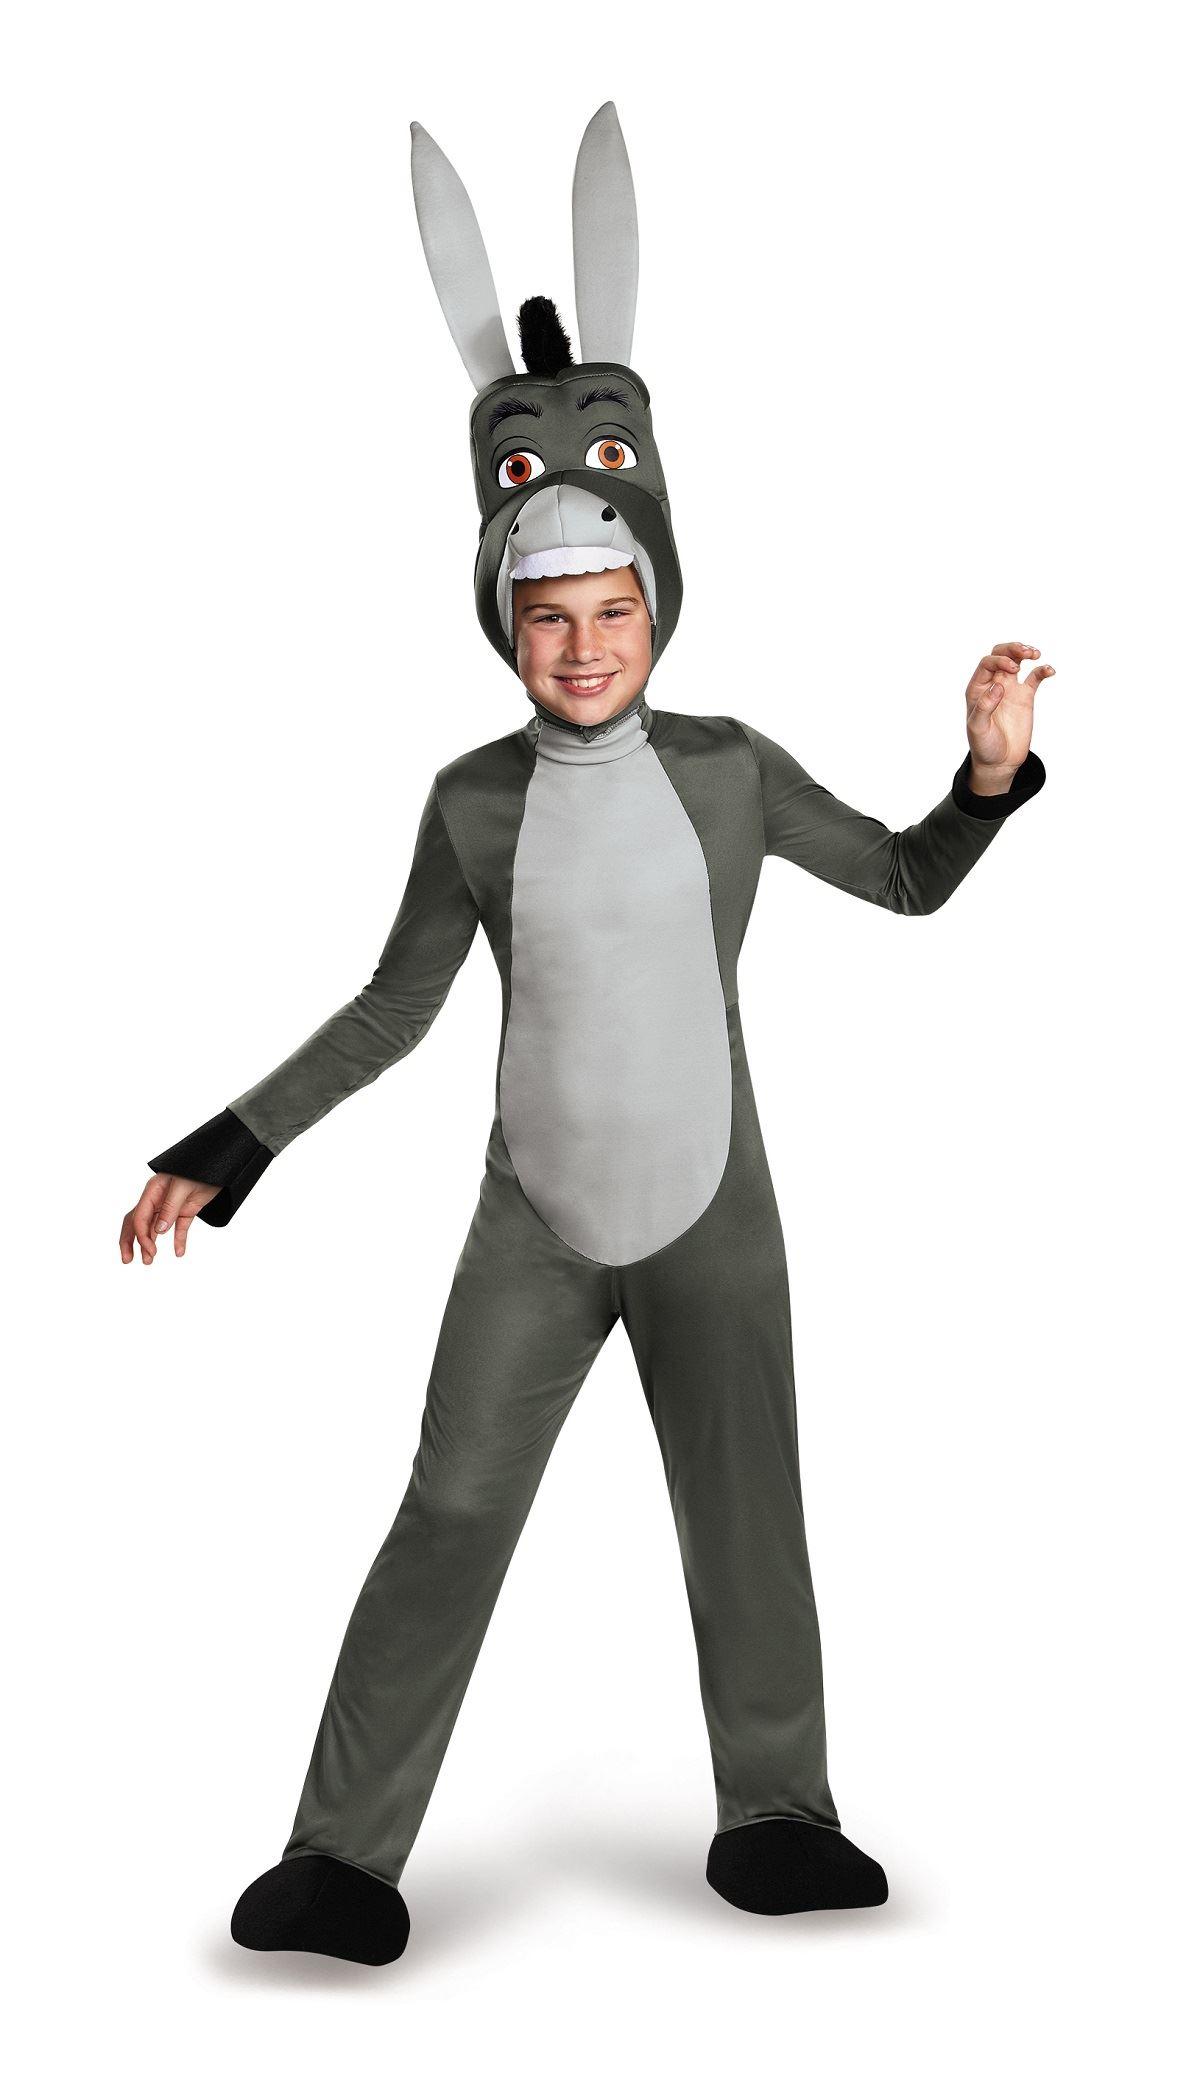 Kids Shrek Donkey Boys Costume ...  sc 1 st  The Costume Land & Kids Shrek Donkey Boys Costume | $33.99 | The Costume Land